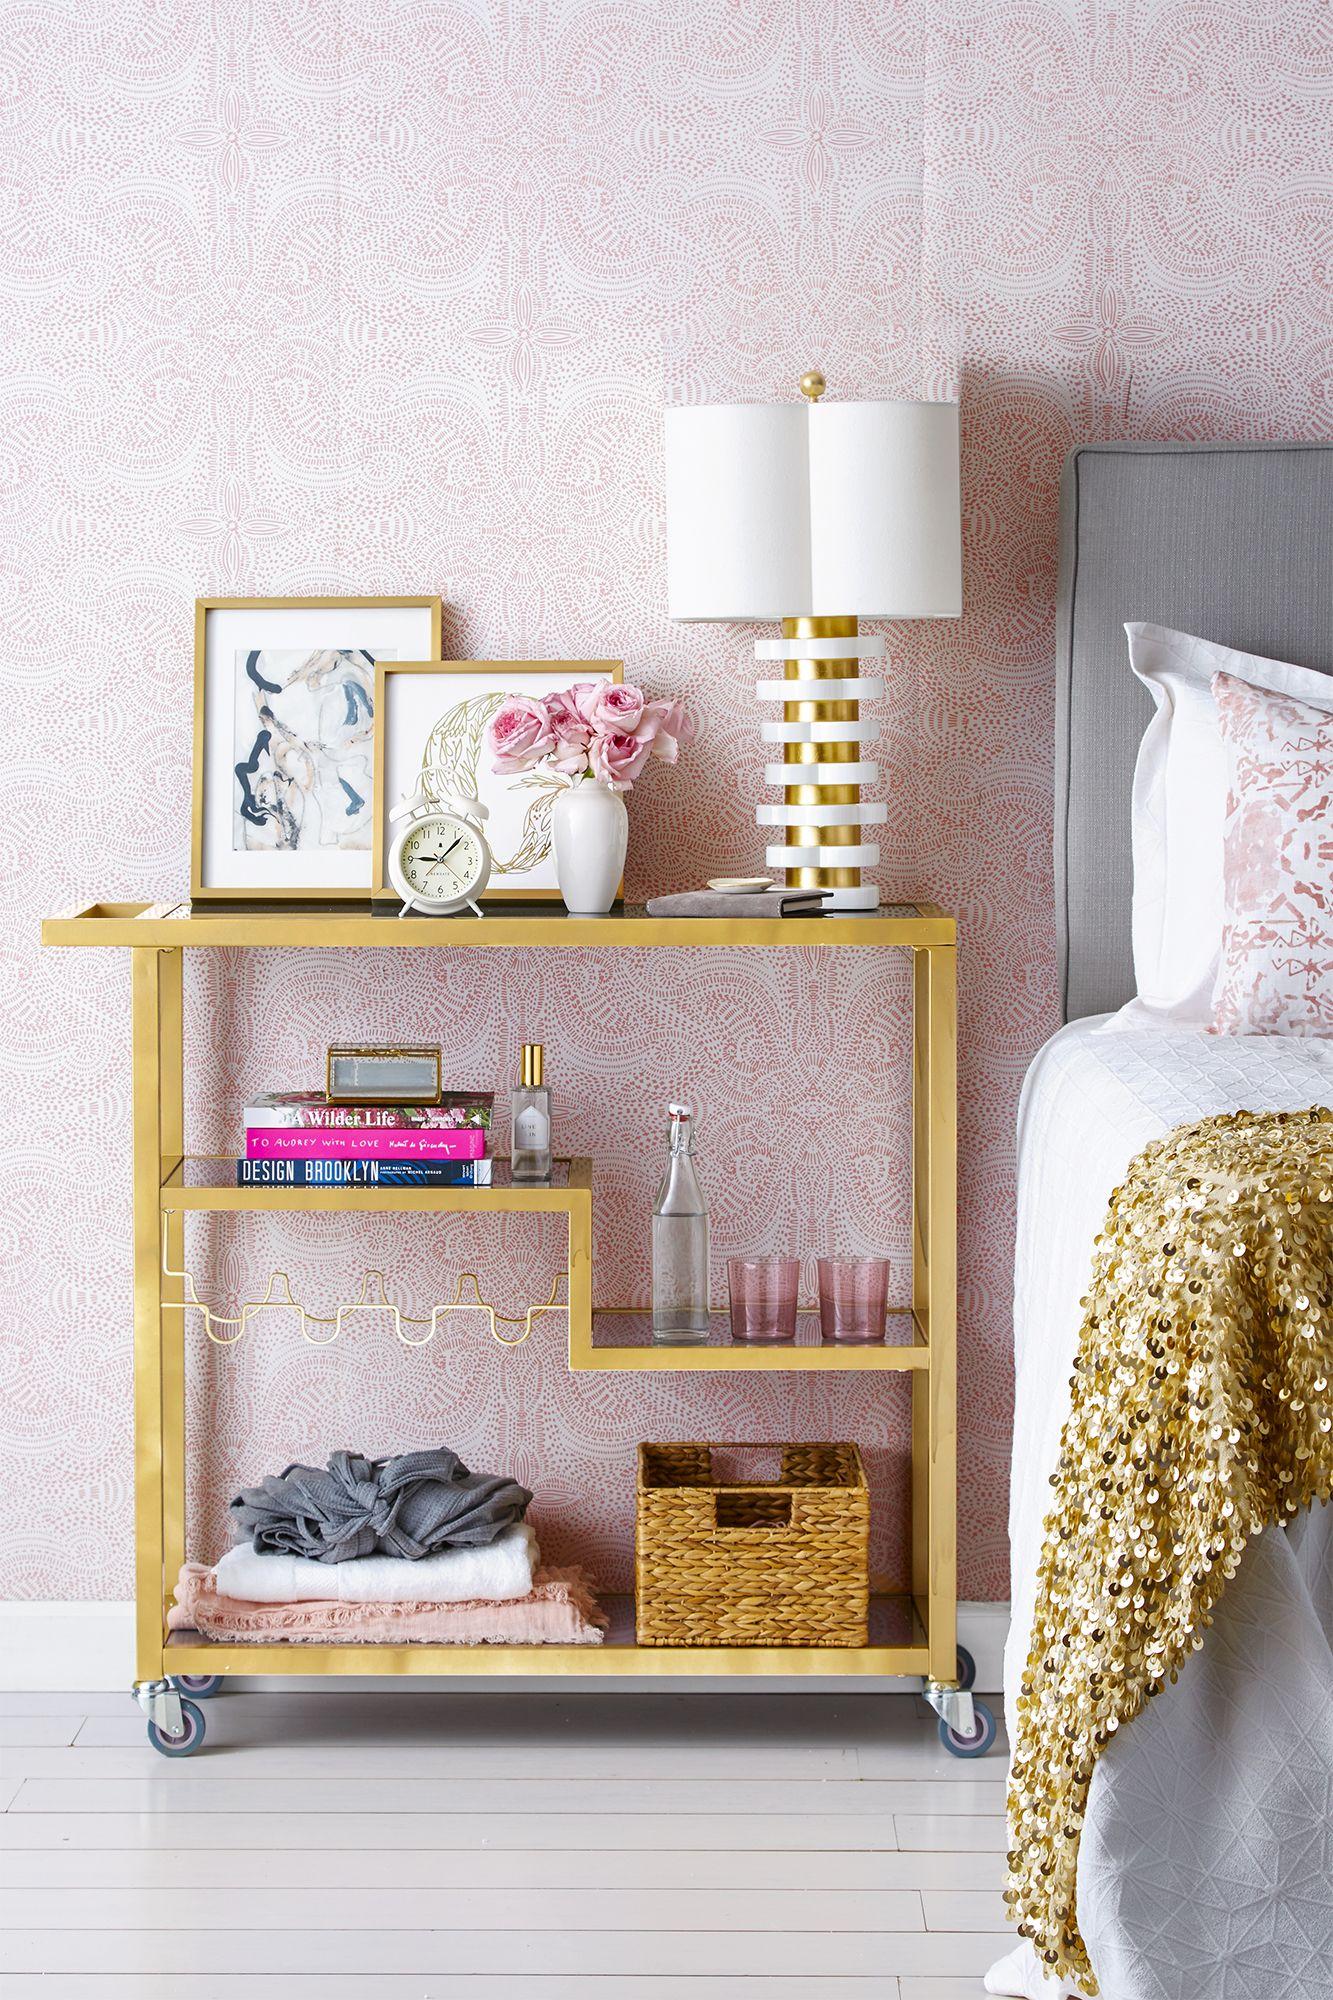 12 Bedroom Storage Hacks